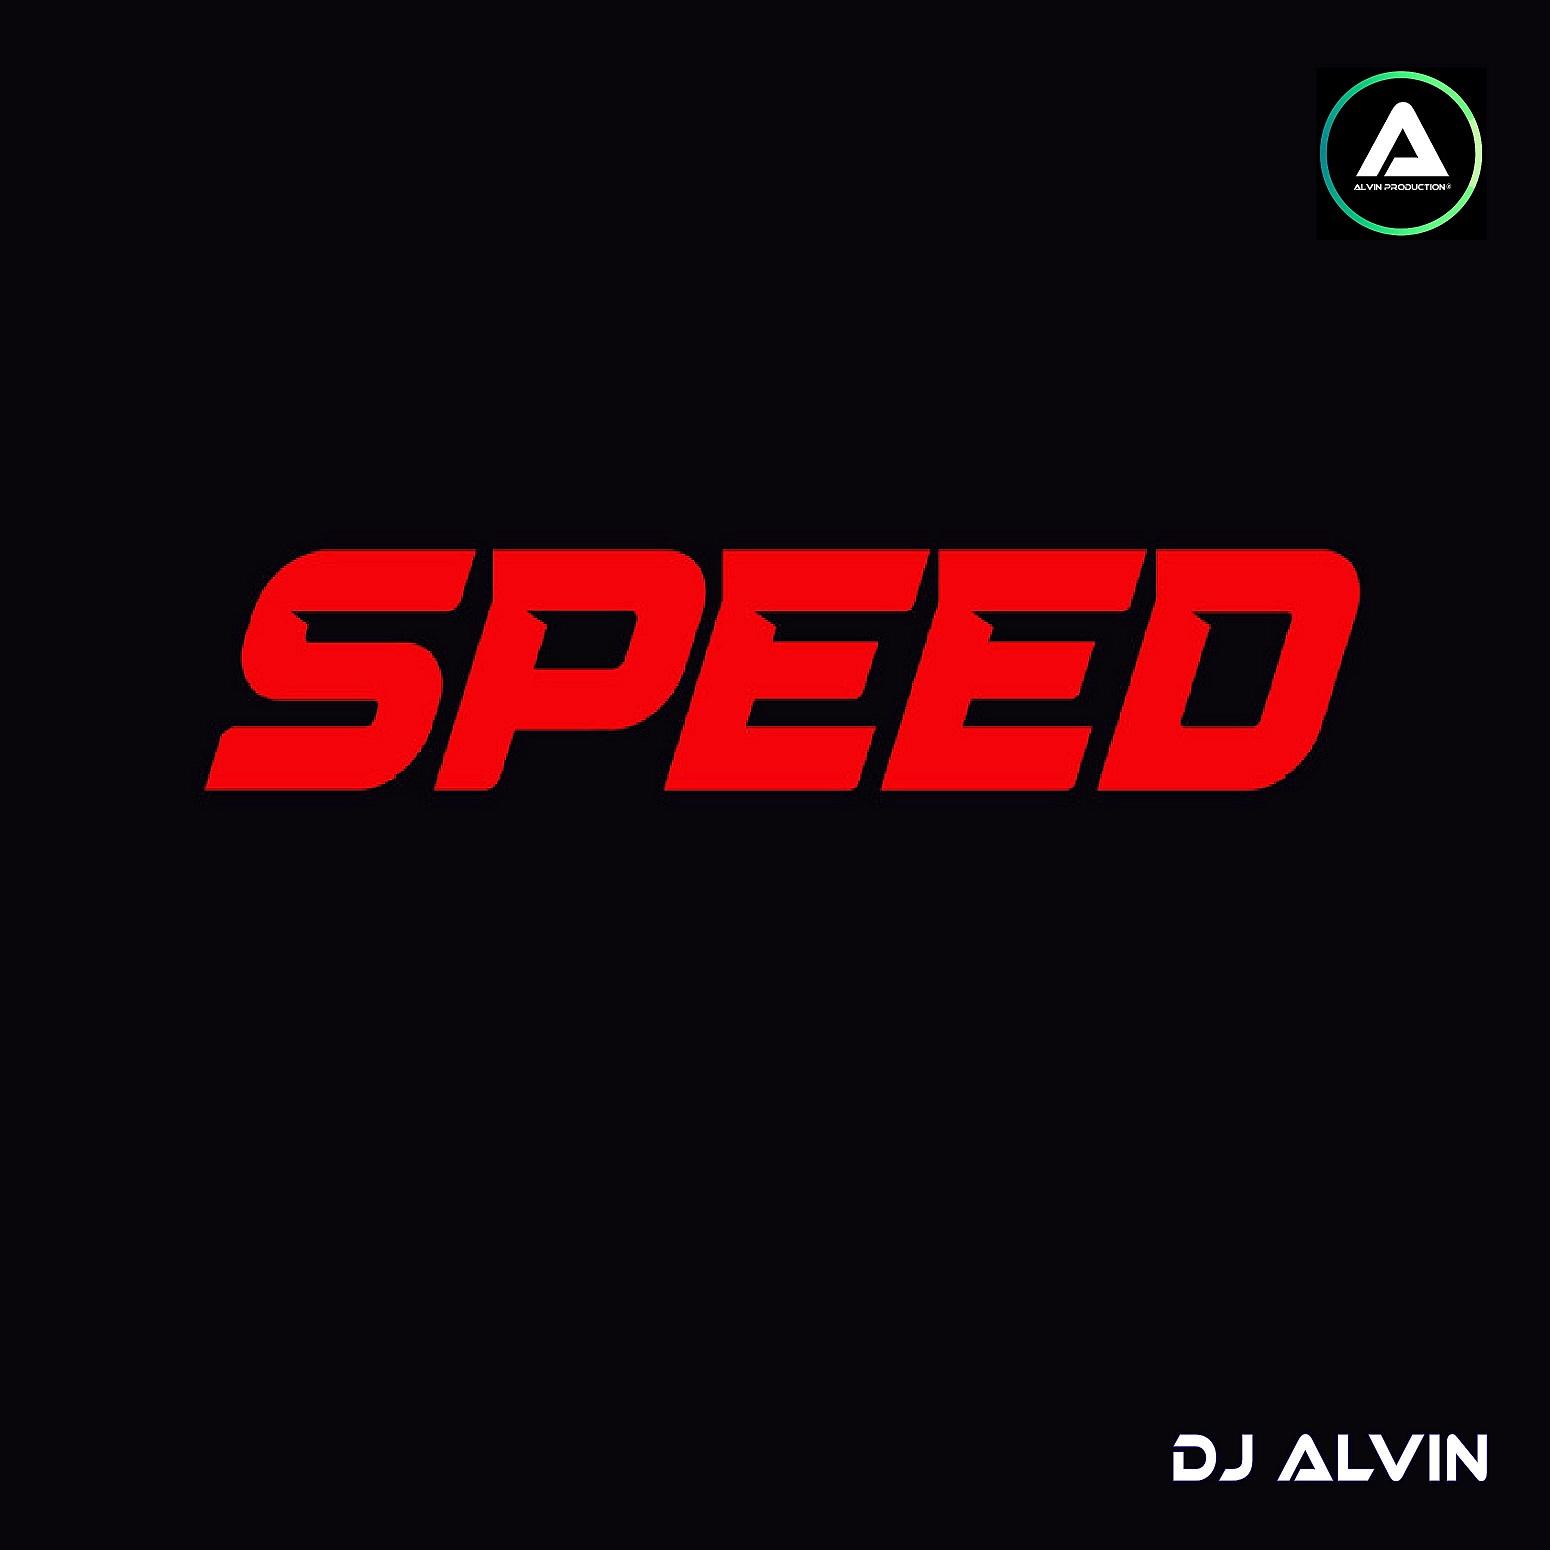 ALVIN-PRODUCTION ® - DJ Alvin - Speed